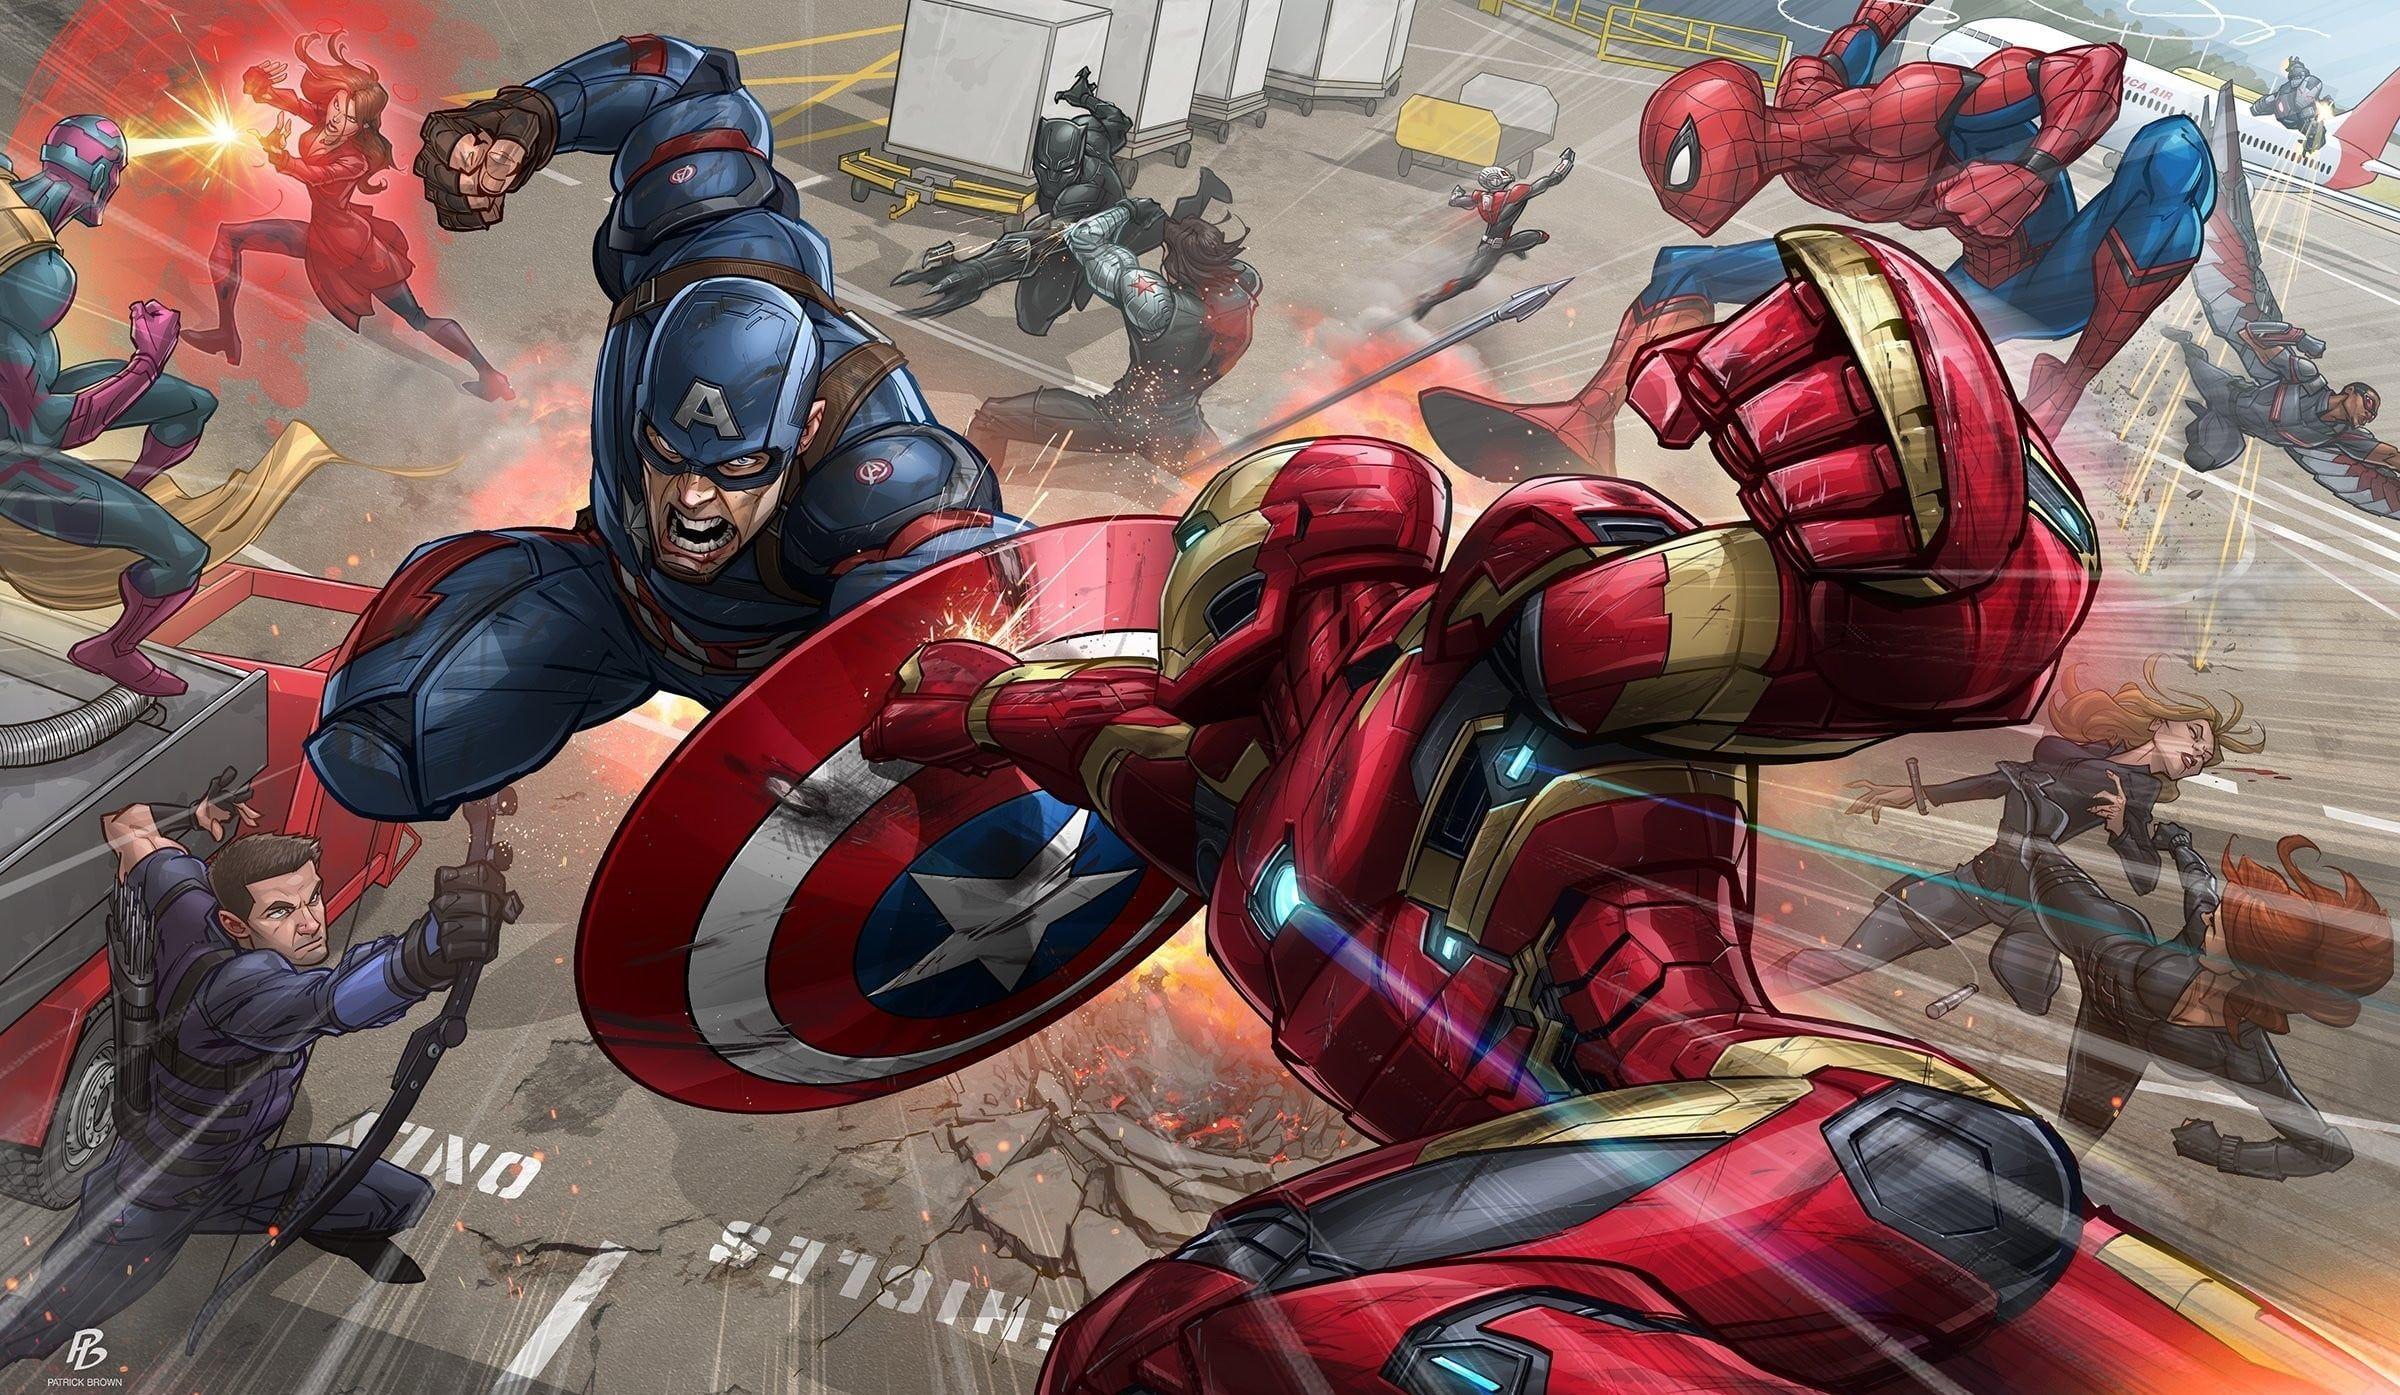 Hd Wallpaper Marvel Avengers Civil War Wallpaper Iron Man Captain Avengers Wallpaper War Wallpaper Avengers Wallpaper Iron Man